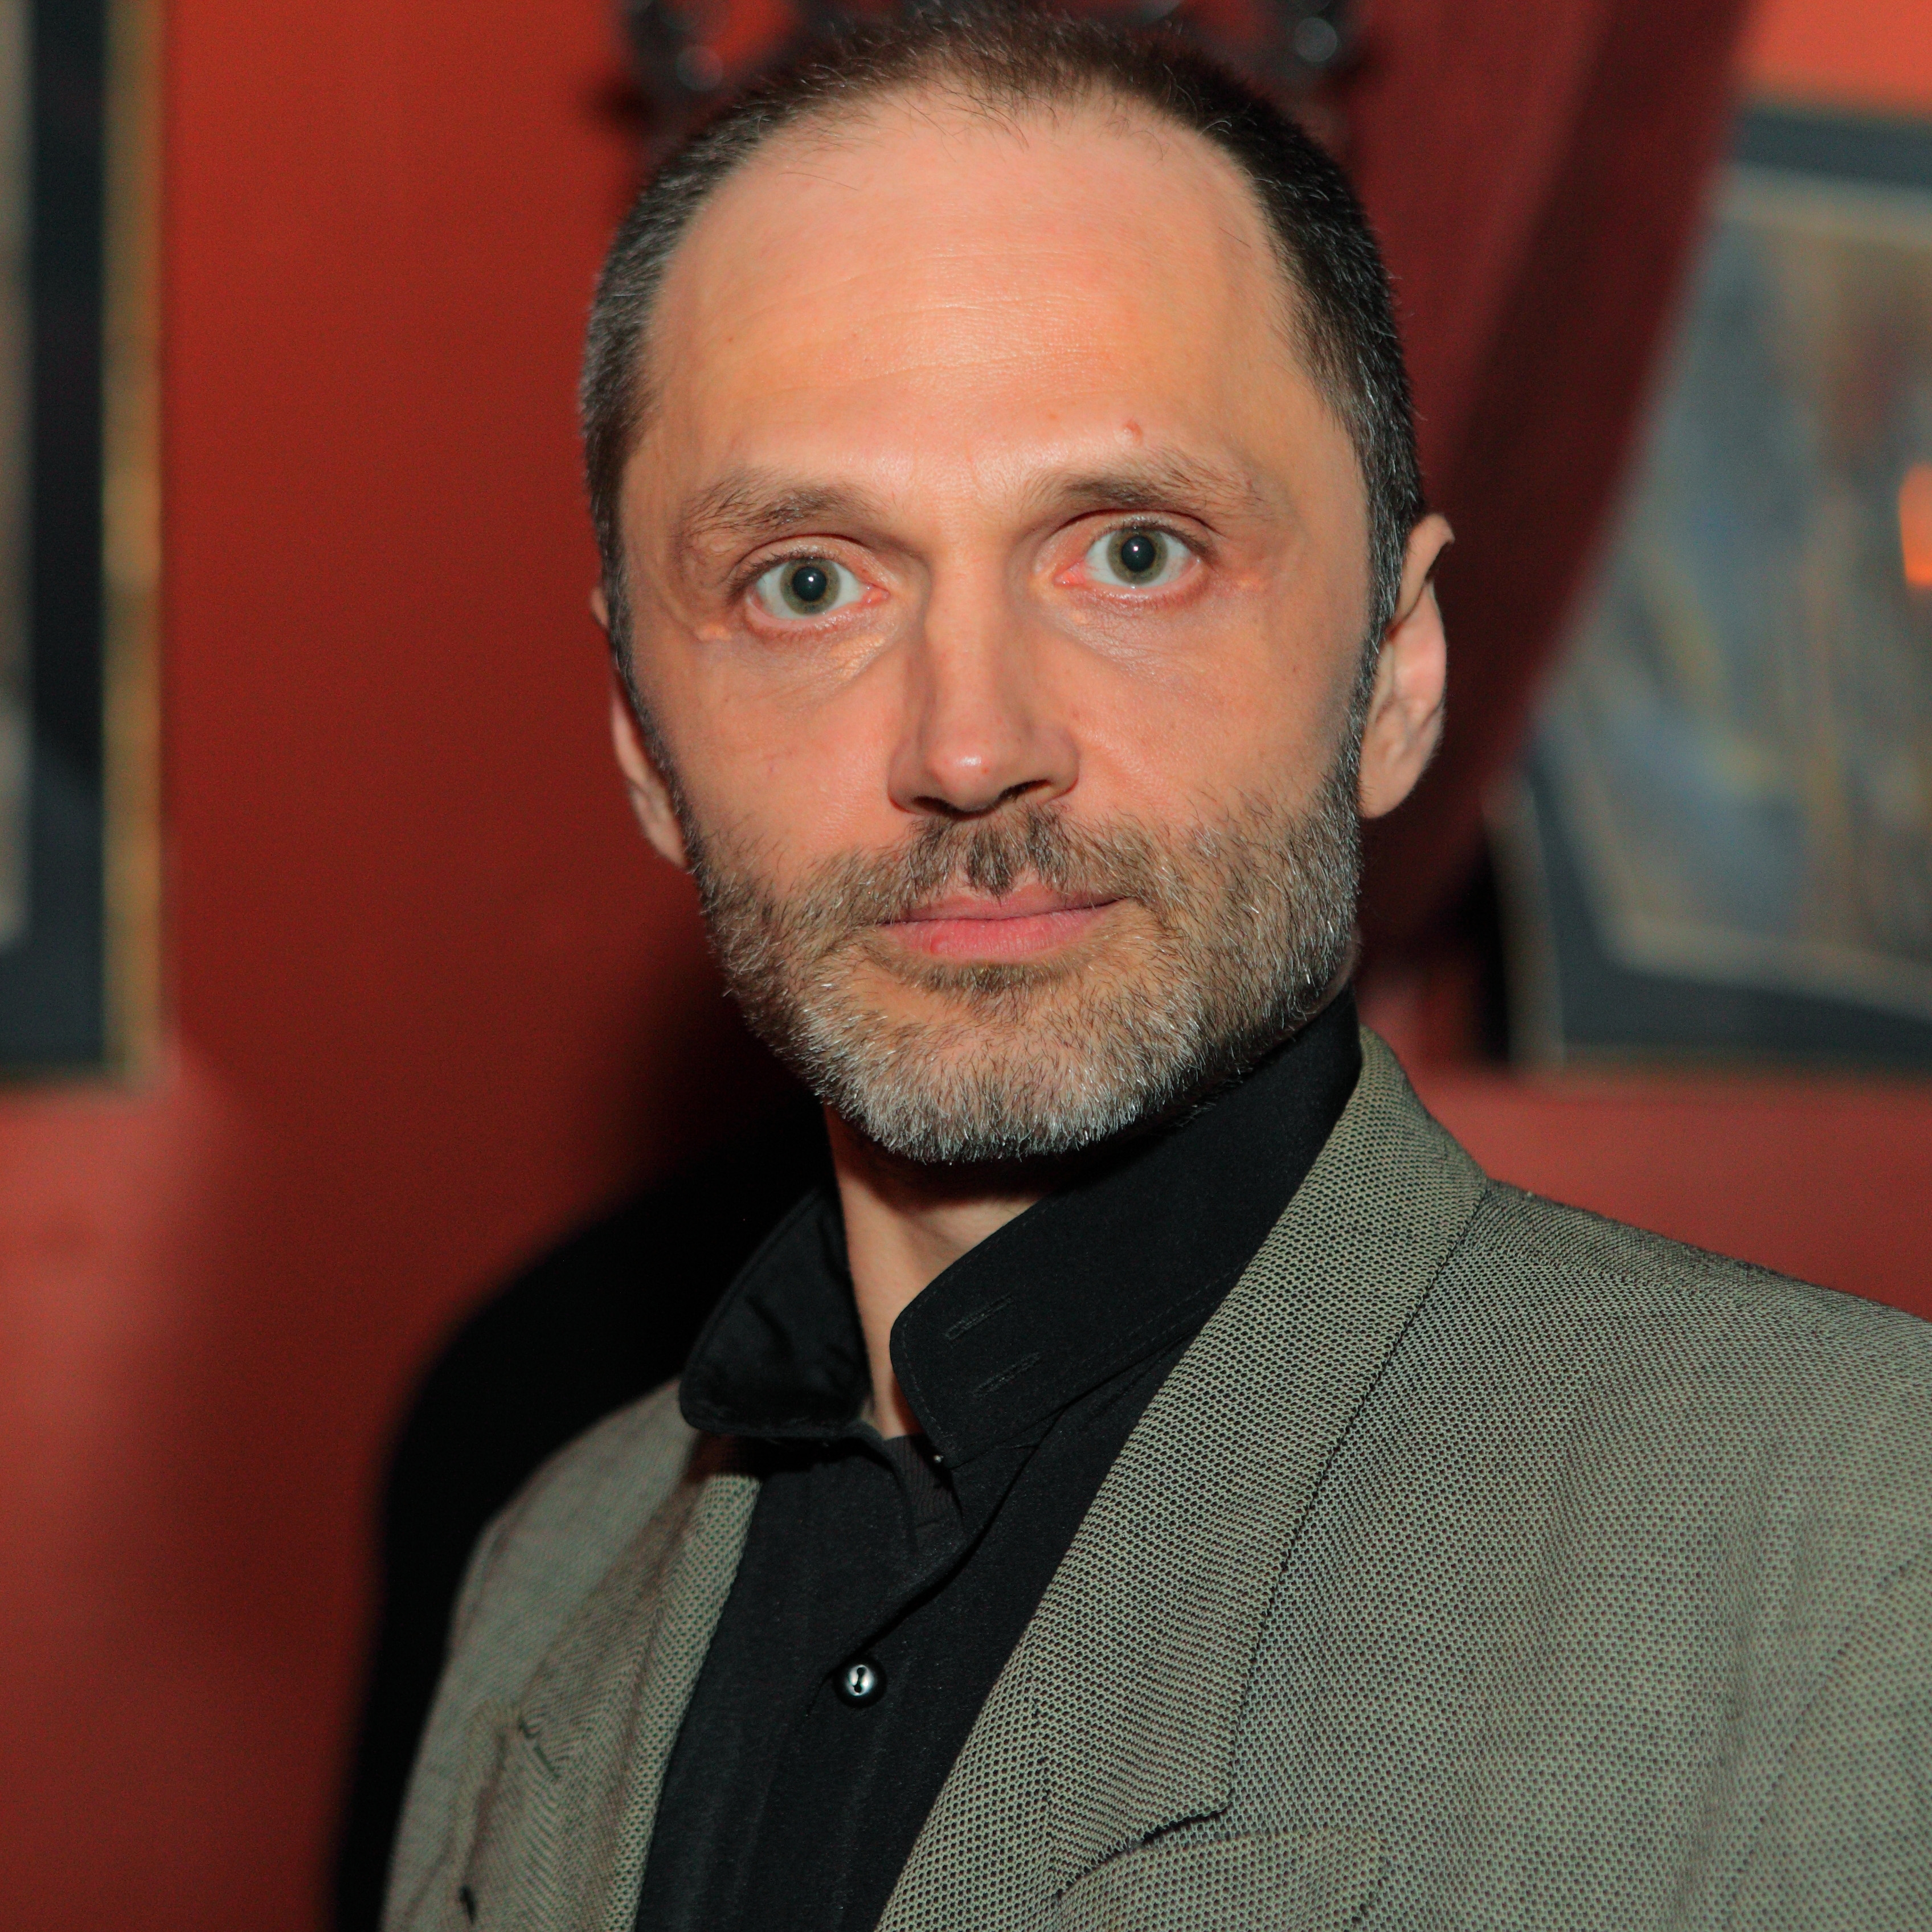 Stefan Kristinkov